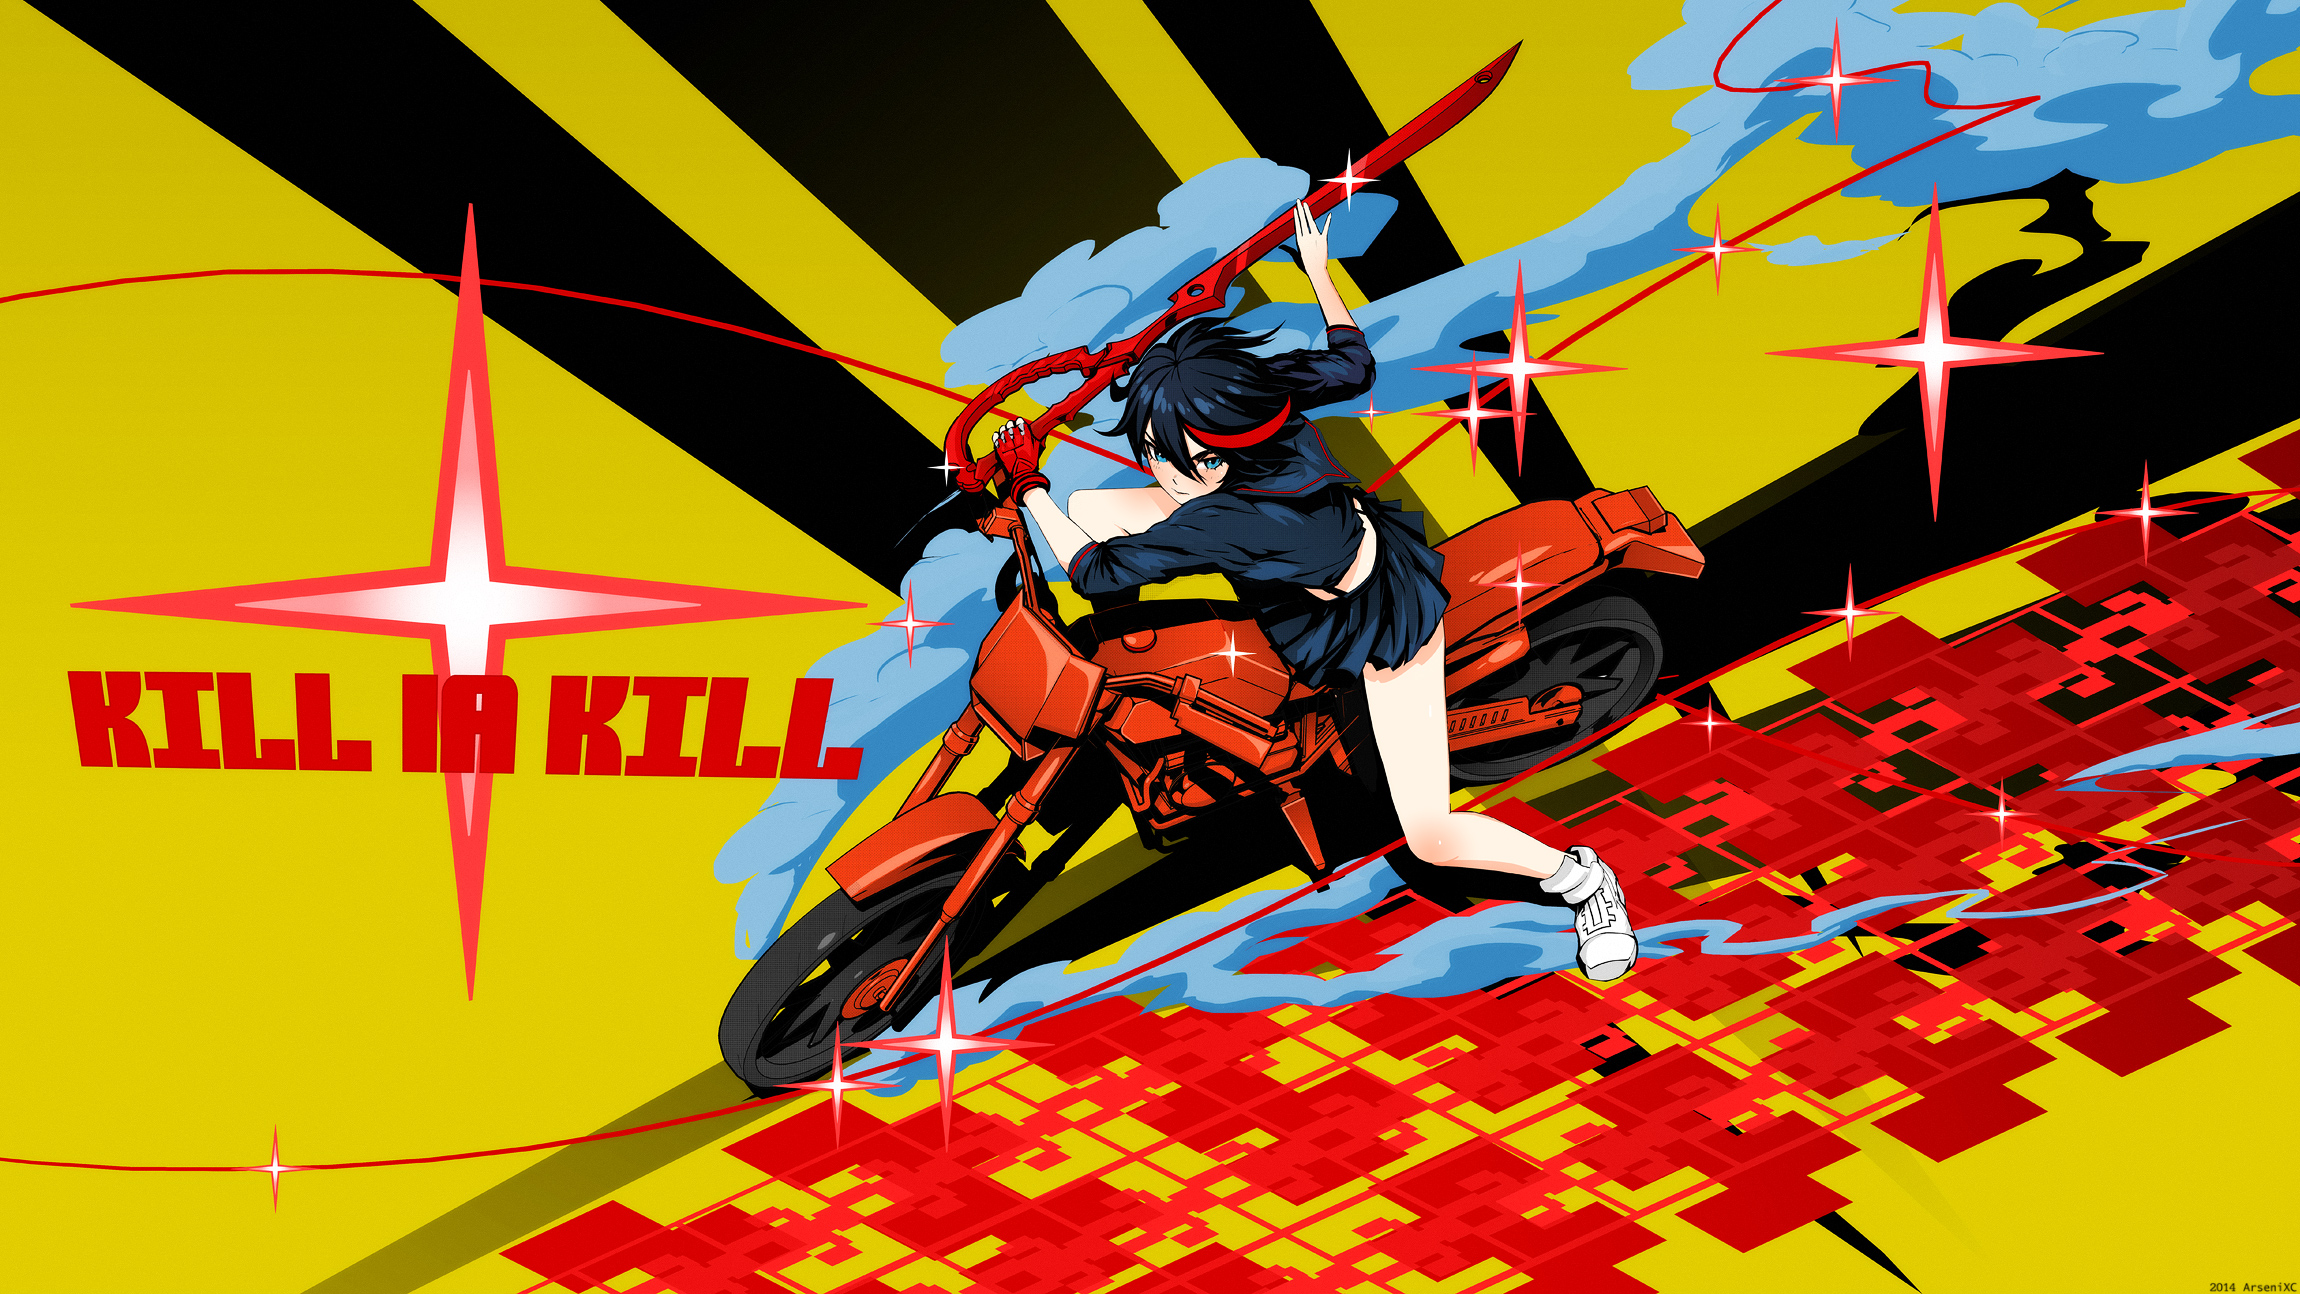 Kill La Kill HD Wallpaper | Background Image | 2300x1294 ...